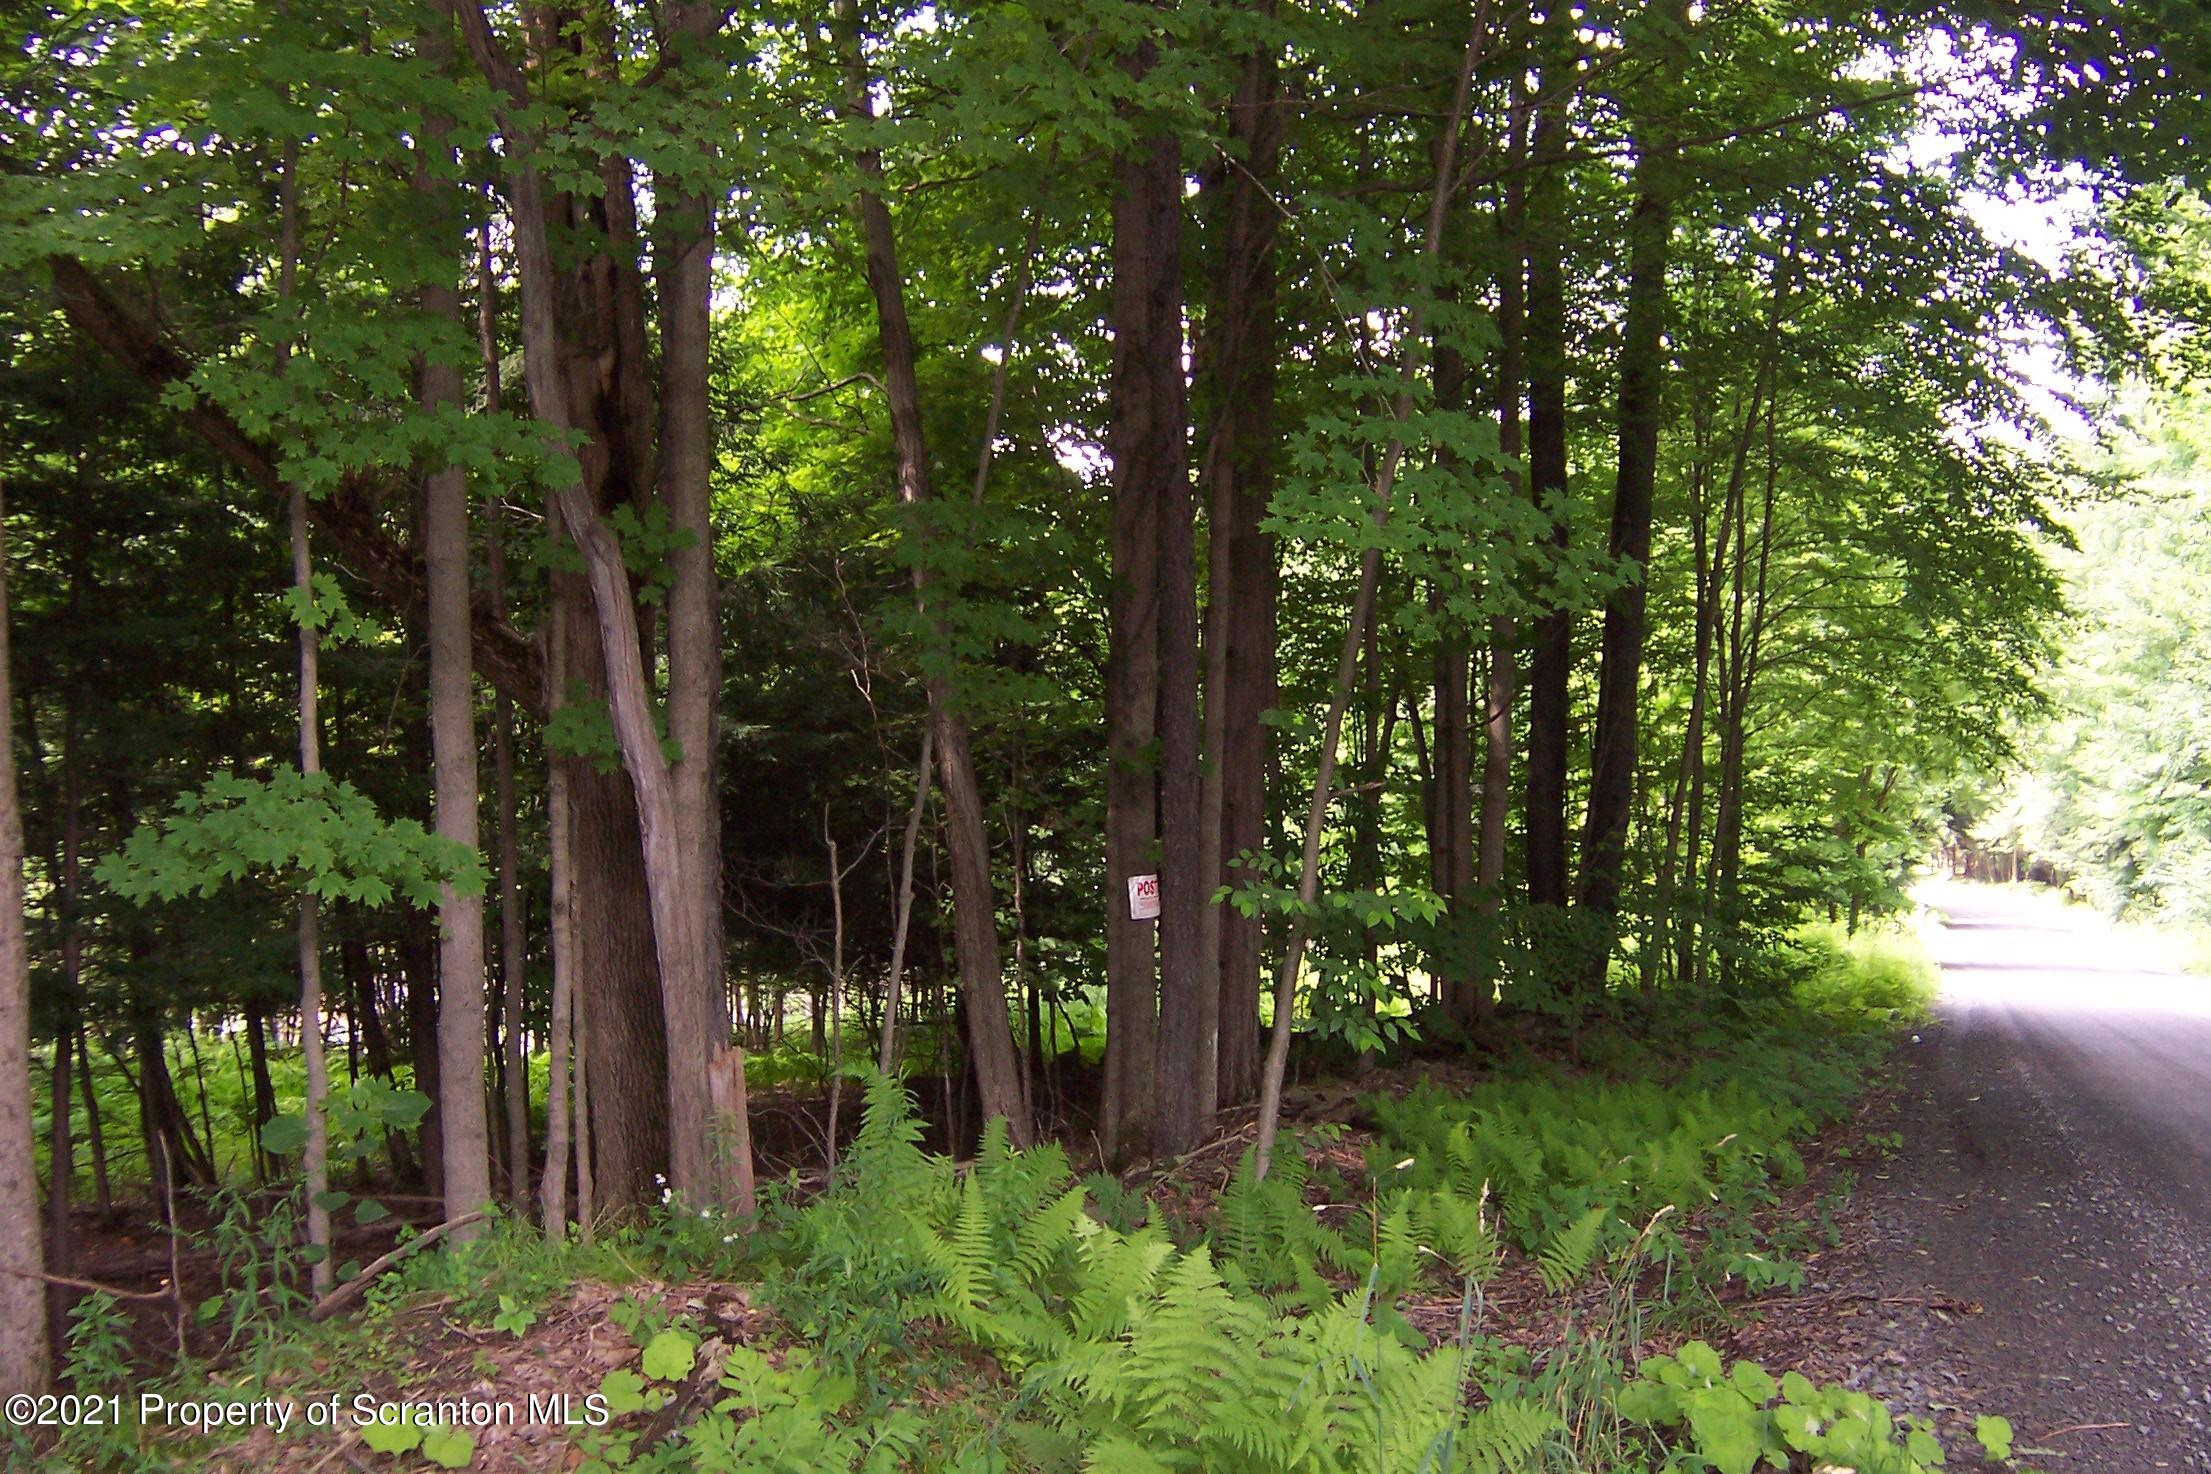 691-627 Bronson Hill Rd, New Milford, Pennsylvania 18834, ,Land,For Sale,Bronson Hill Rd,21-3107